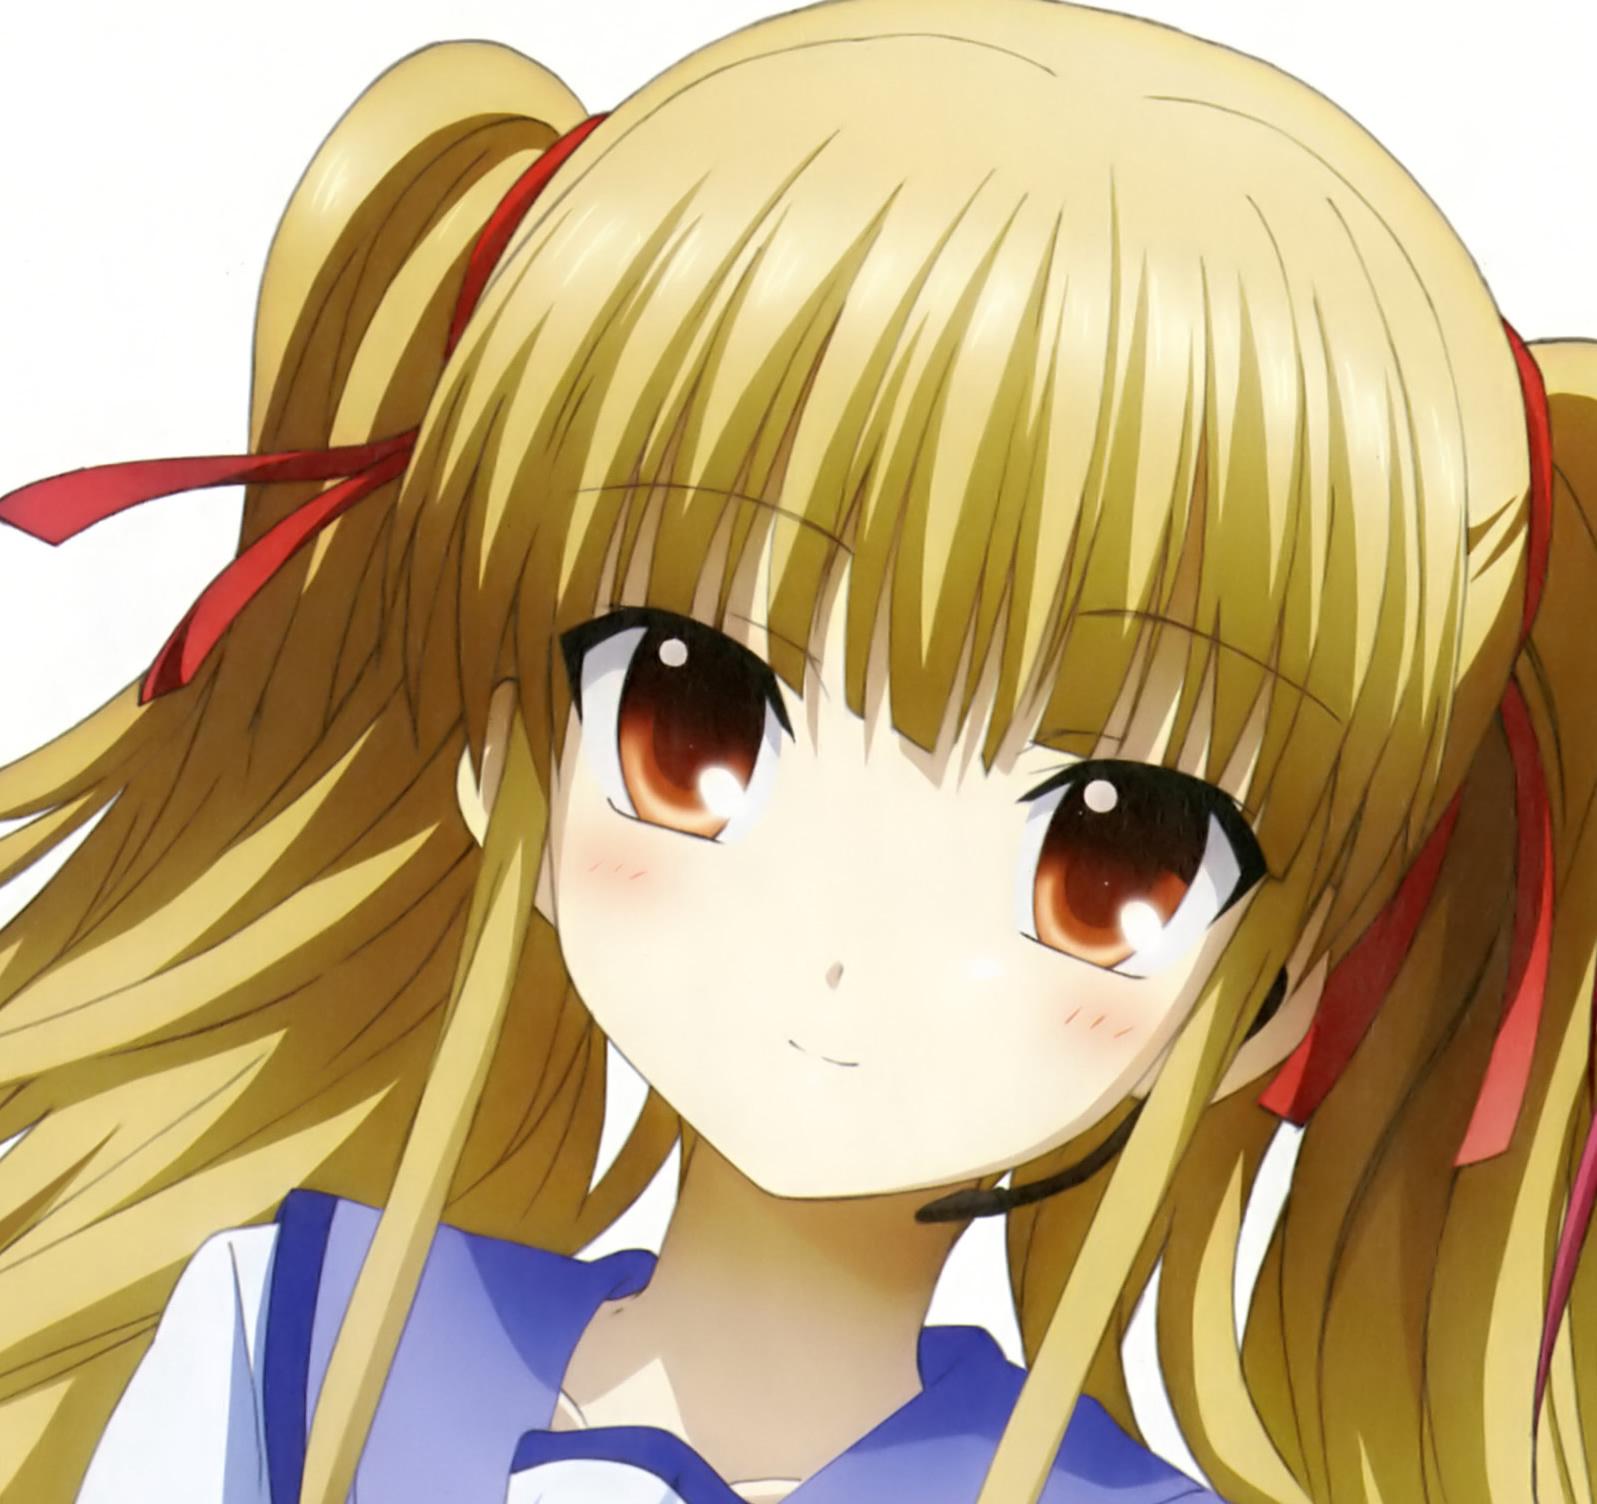 http://images1.wikia.nocookie.net/__cb20130201185924/samina-uchiha-julieta/es/images/0/08/Moe-148949-angel_beats-detexted-satou_rika-seifuku-yui_angel_beats-yusa3.jpg